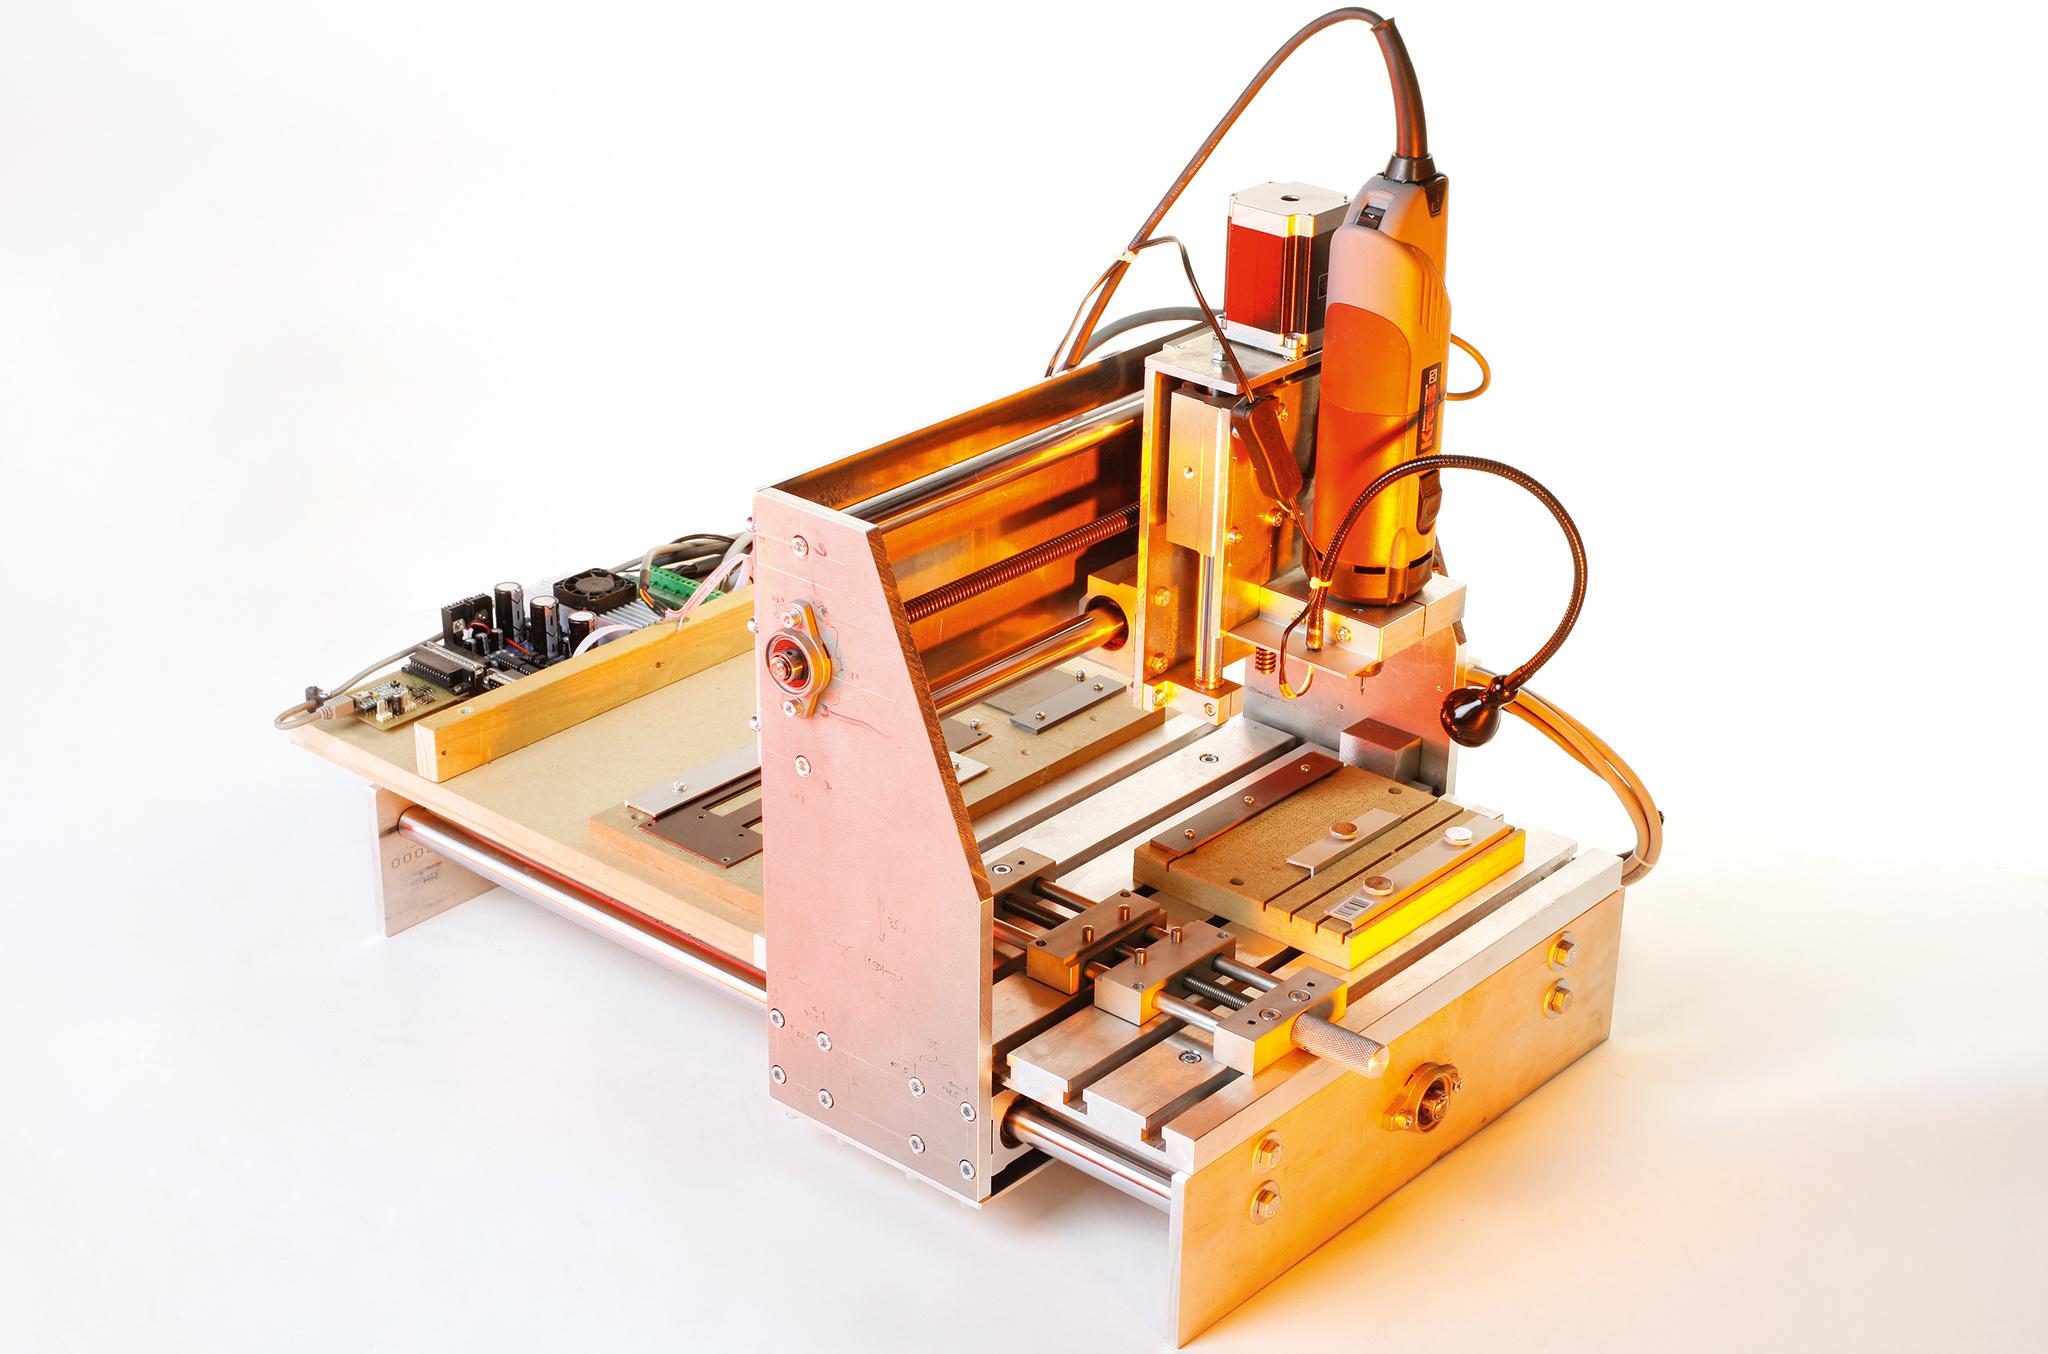 lasern, fräsen, drucken in 3d   make magazin   heise select